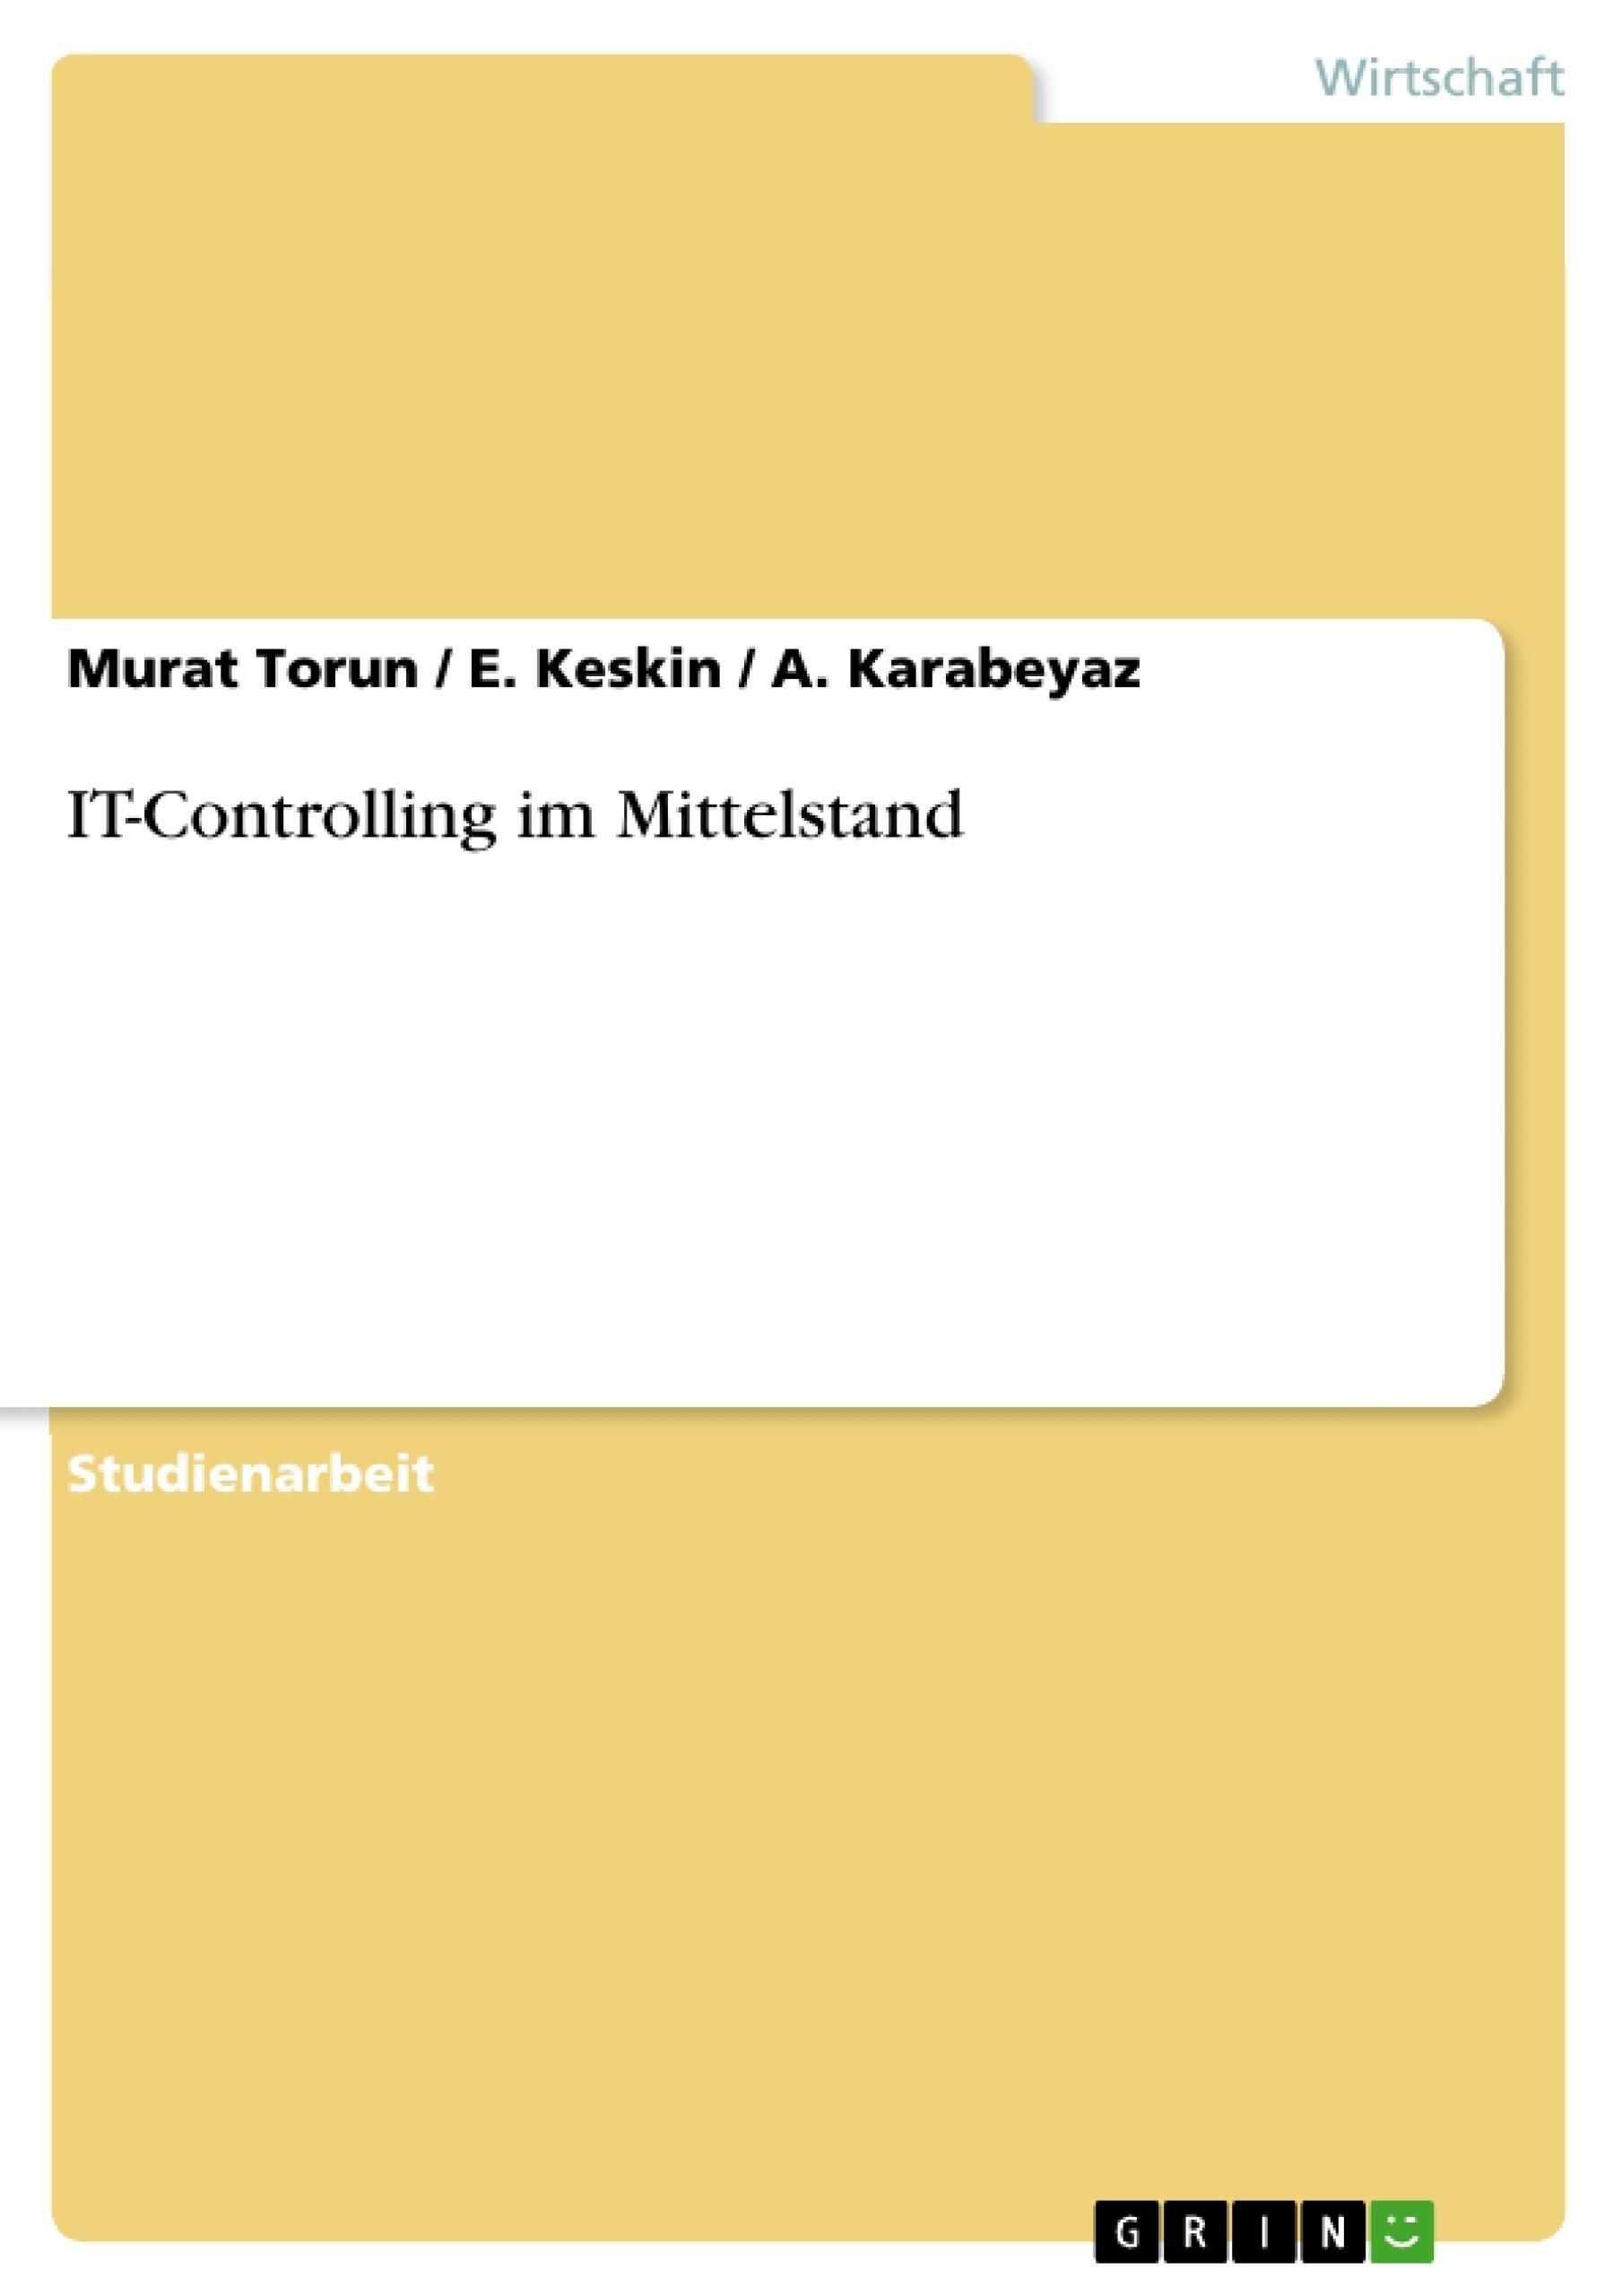 Titel: IT-Controlling im Mittelstand